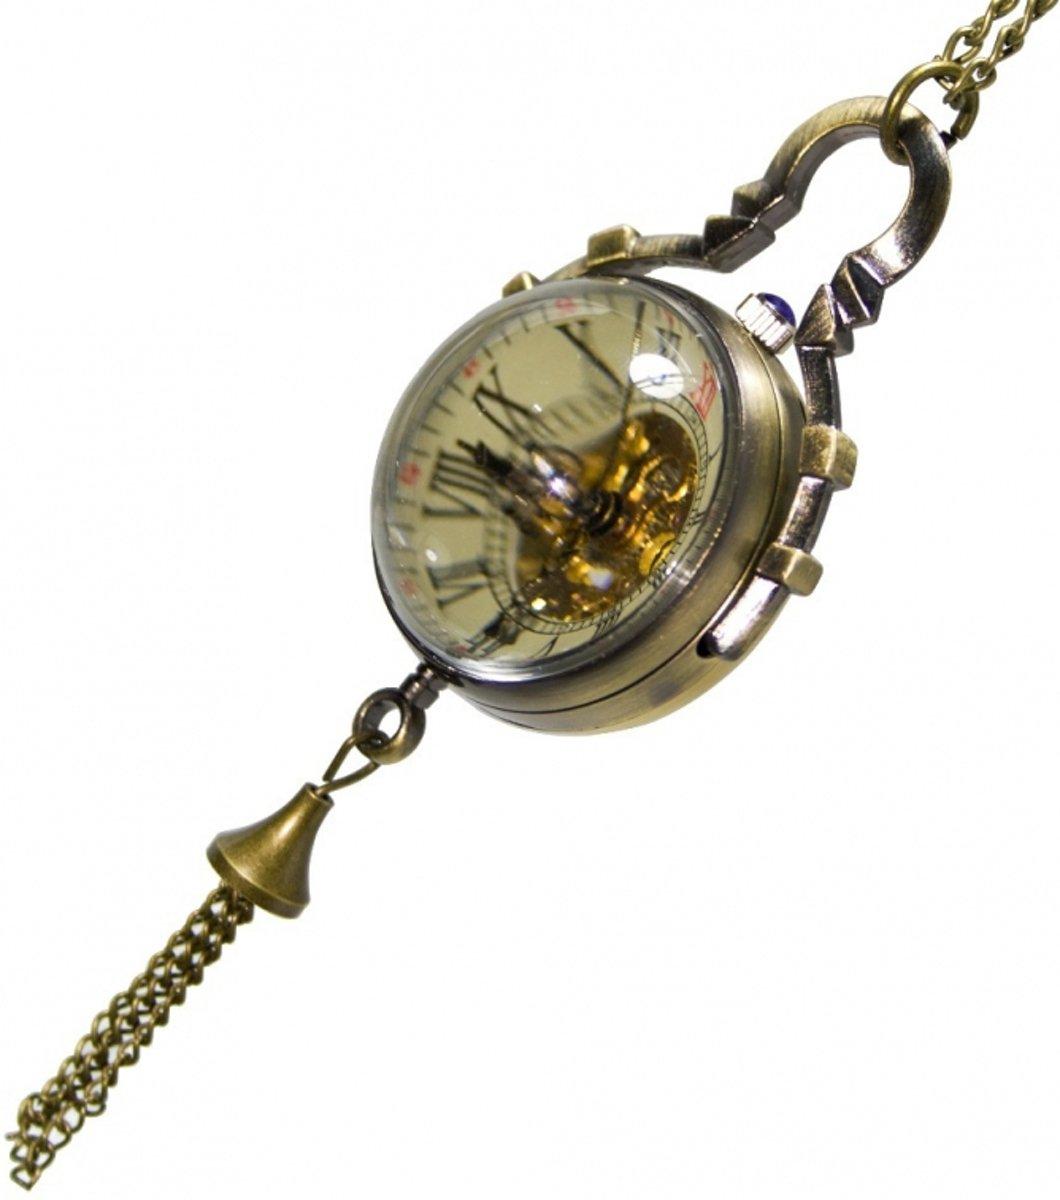 Ketting horloge groot Fisheye- Brons # 50 kopen